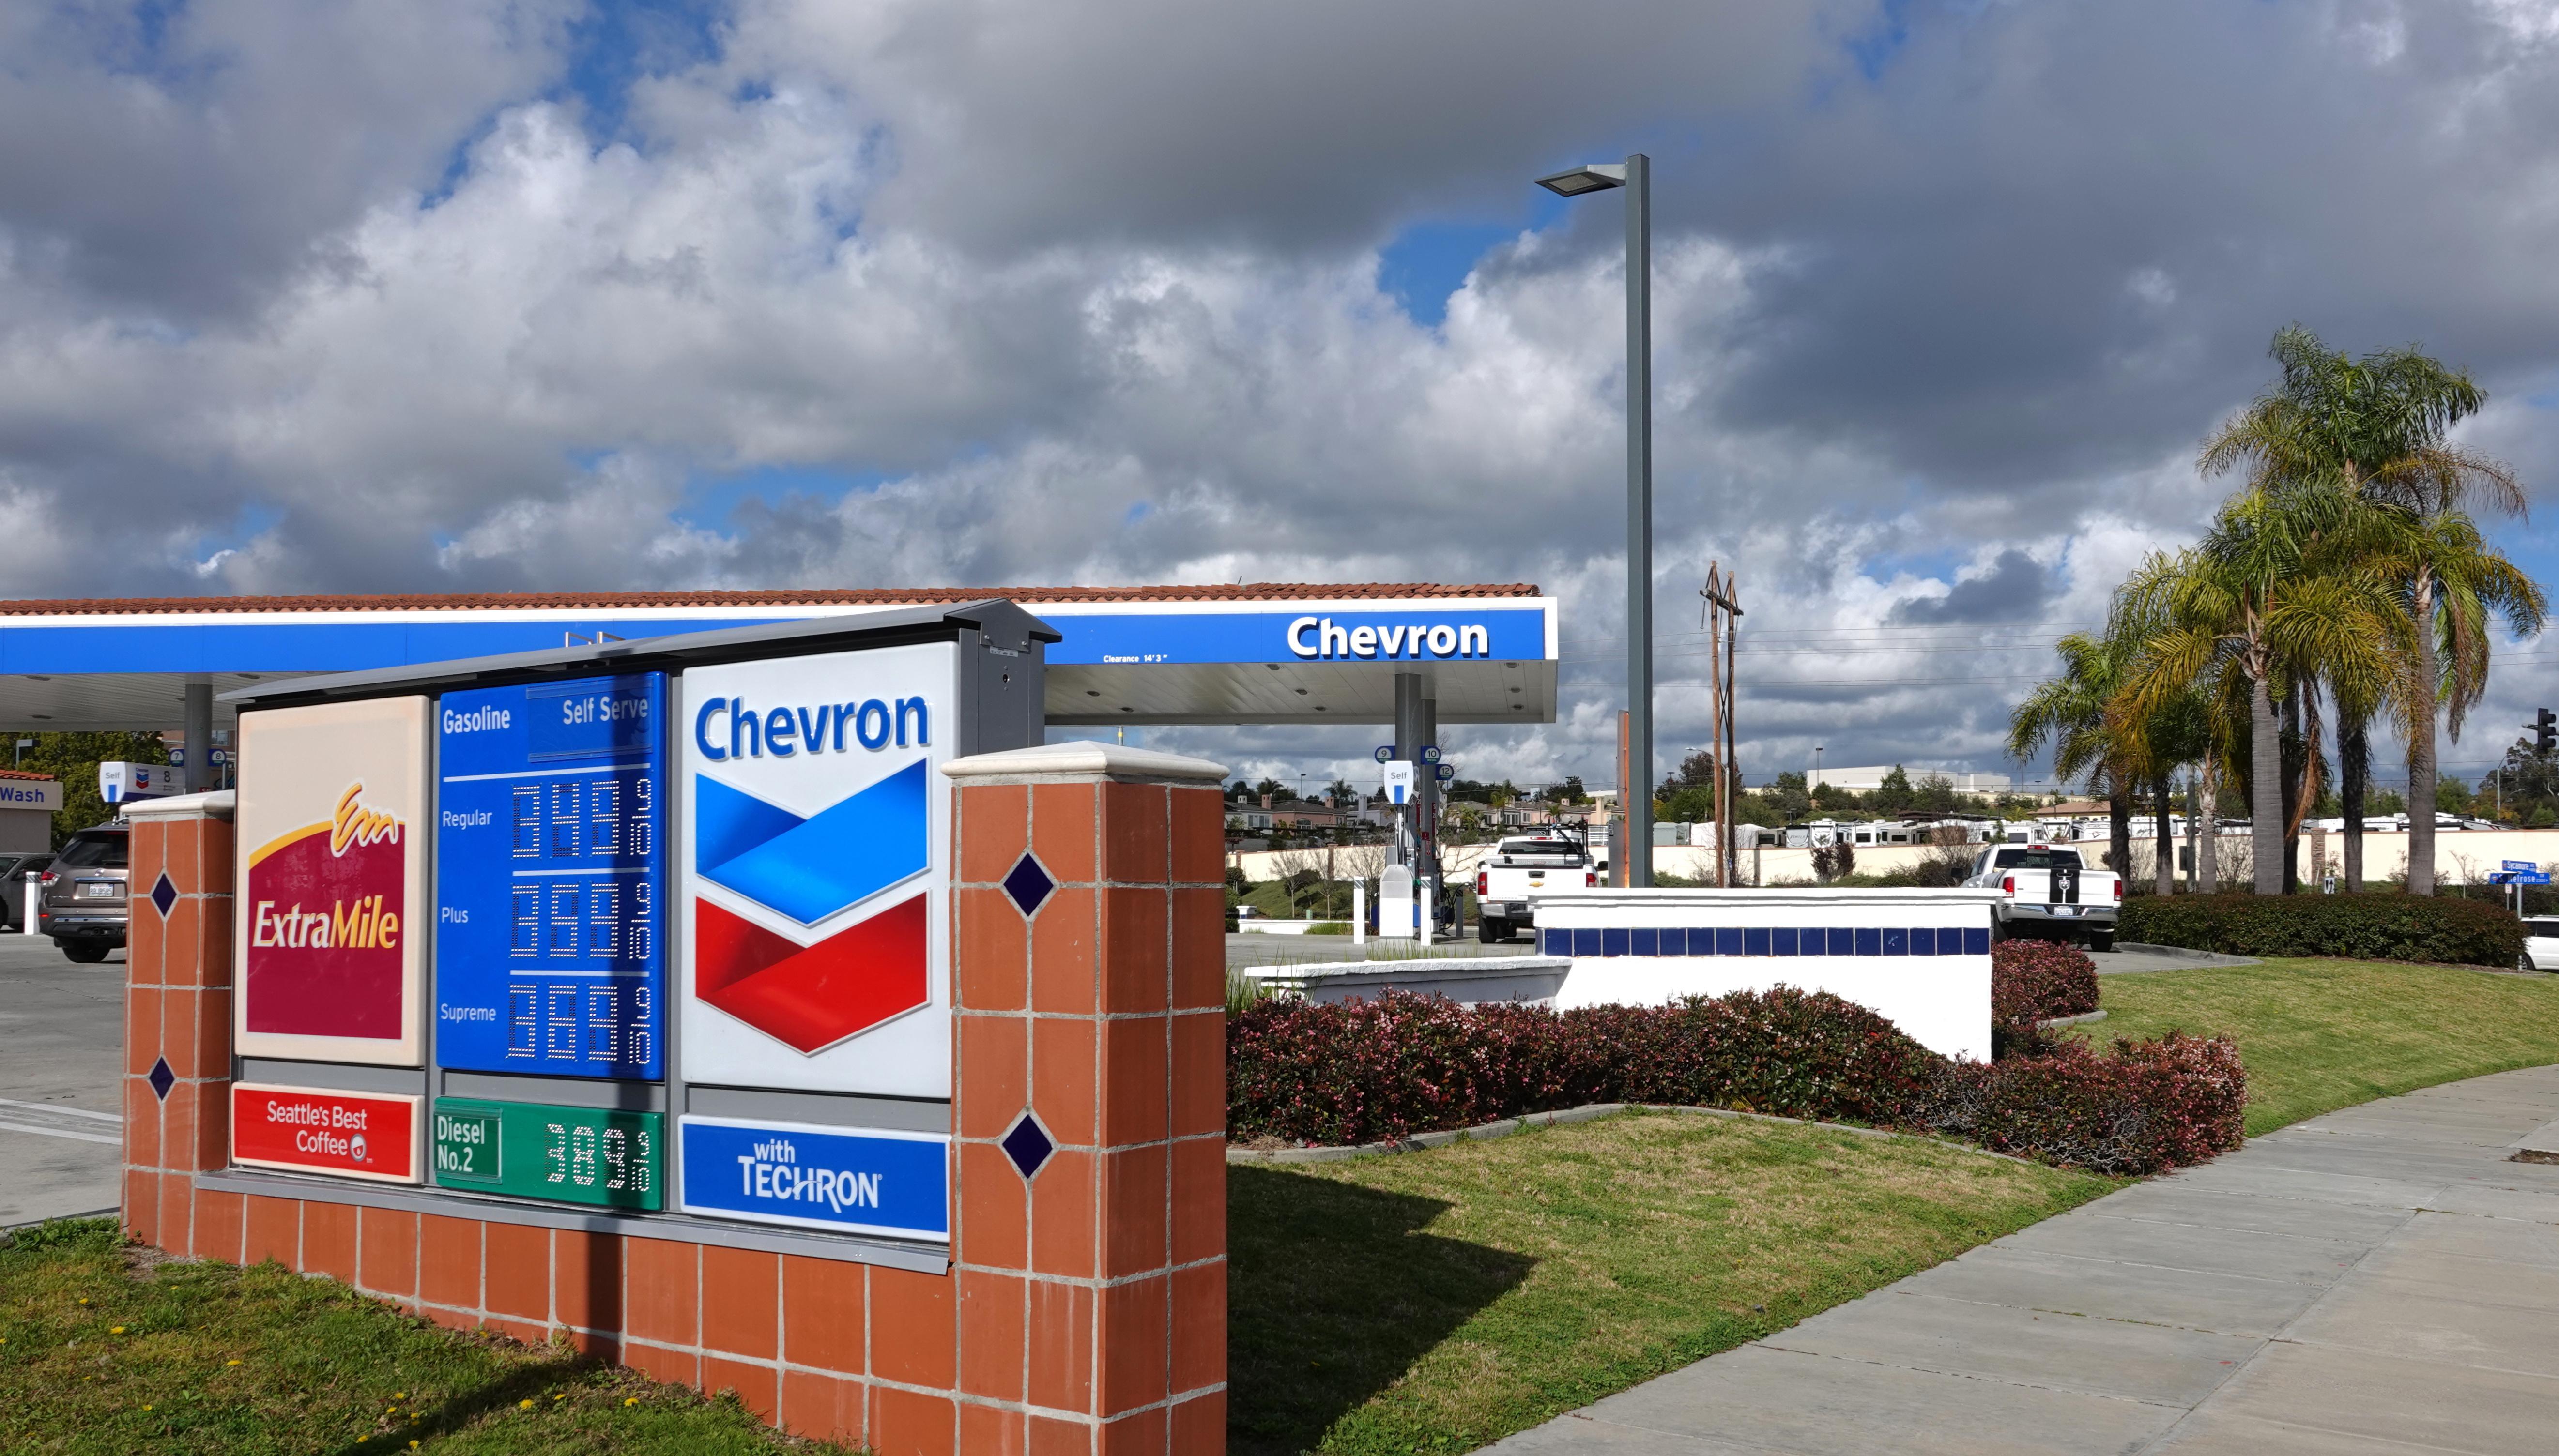 uploads///Chevron stock price CVX today